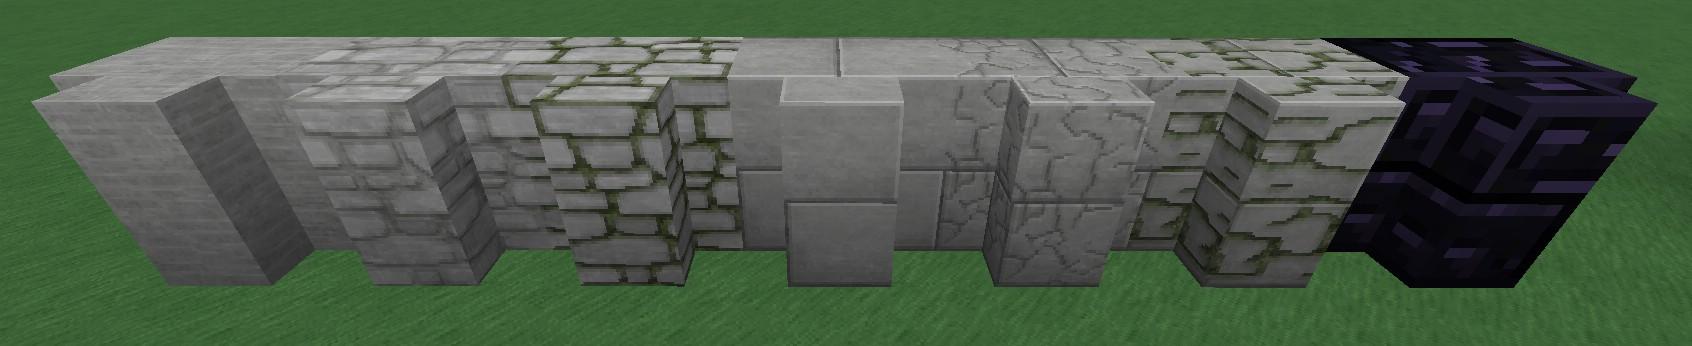 Dungeons-blocks-mod-10.jpg